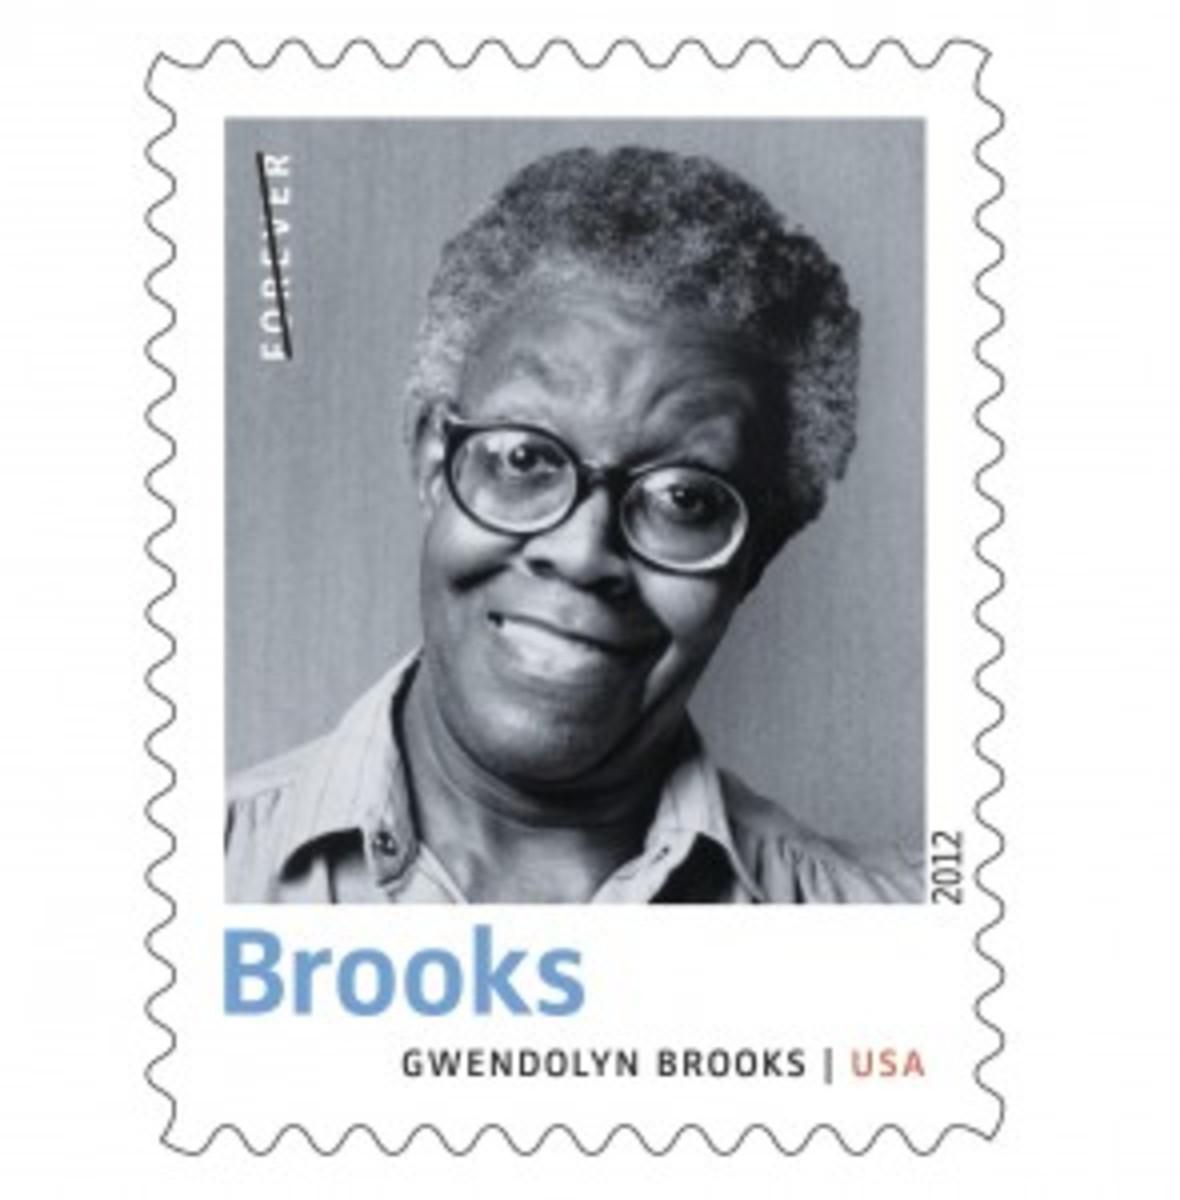 Gwendolyn Brooks stamp